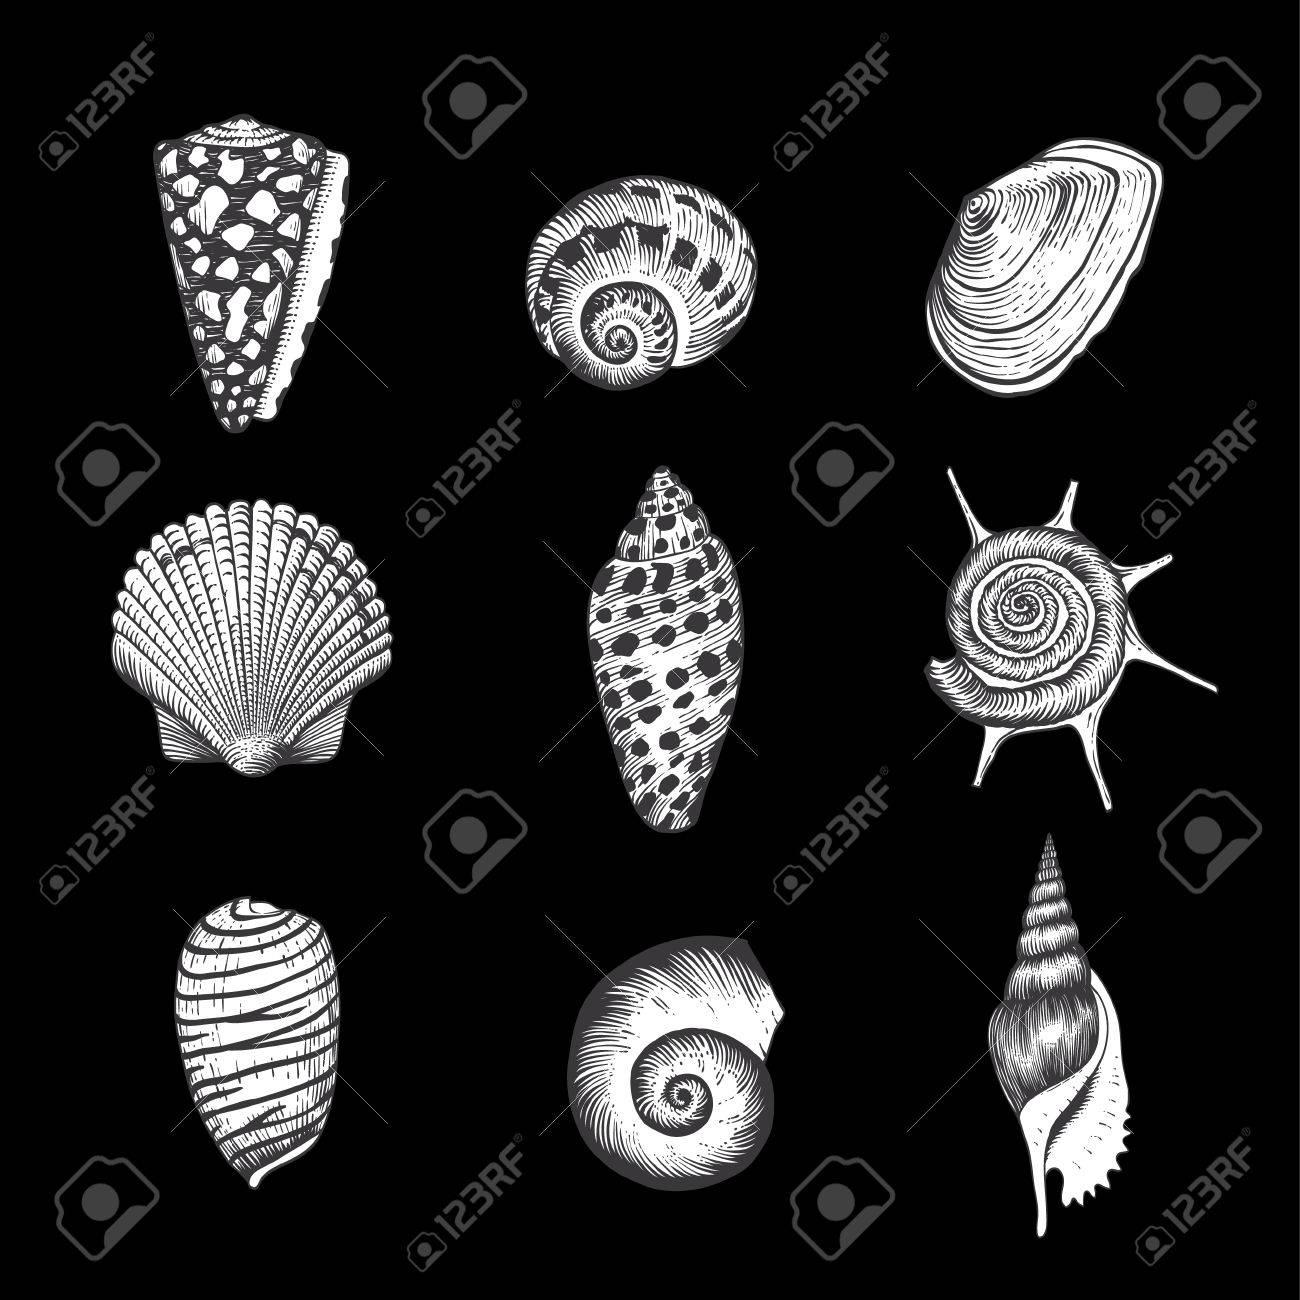 Set of vector vintage seashells nine black and white illustrations